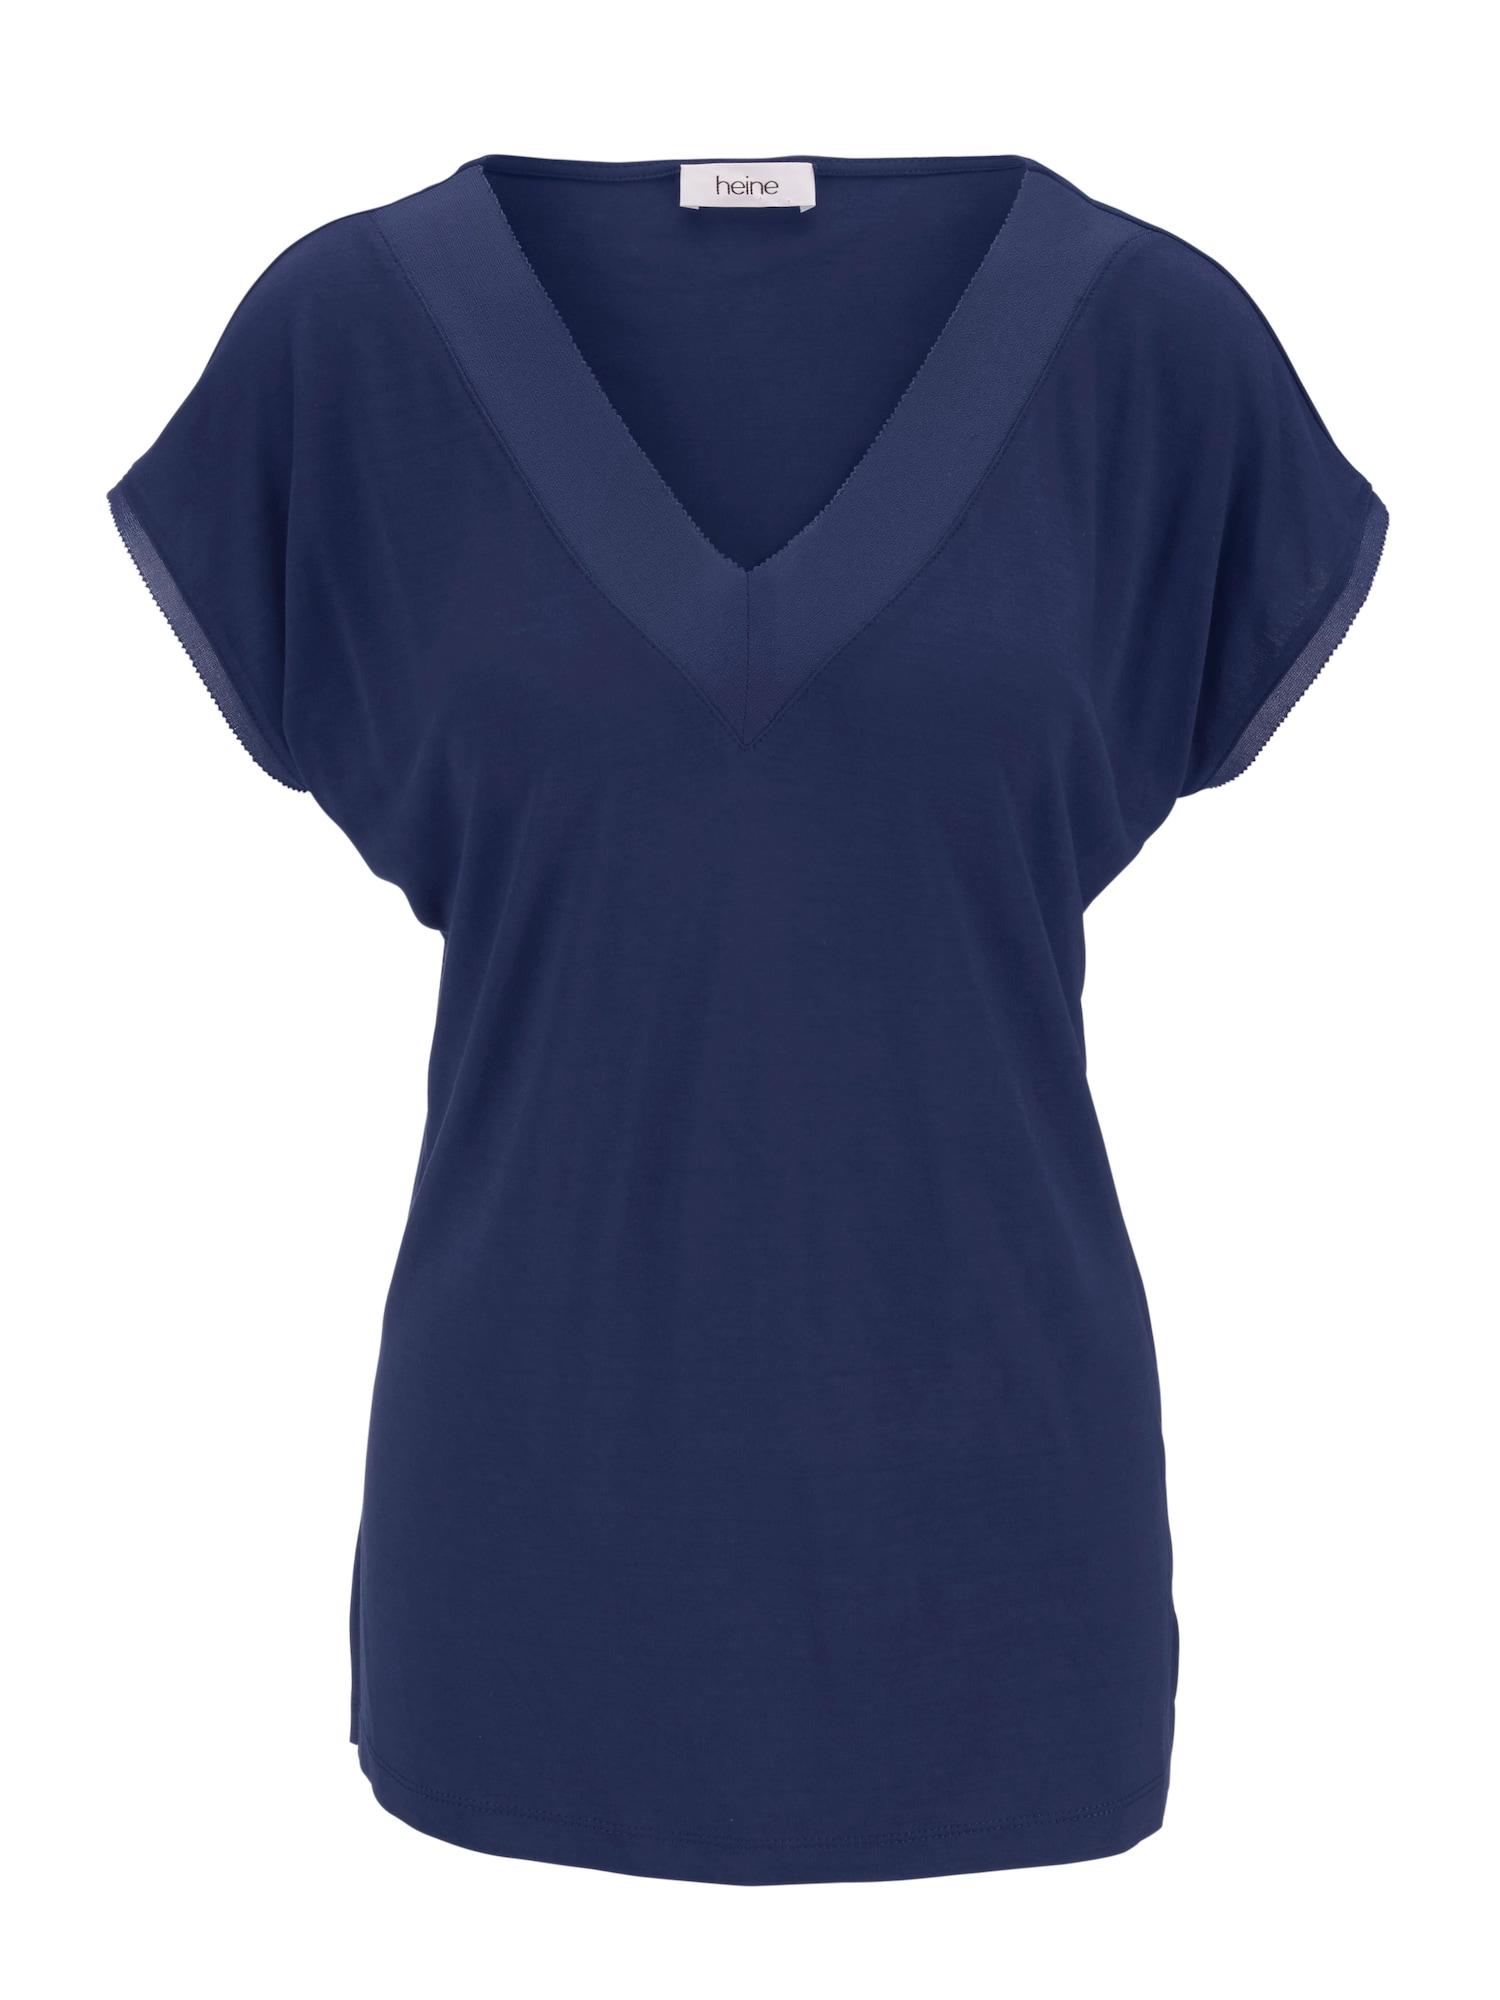 Tričko marine modrá tmavě modrá Heine